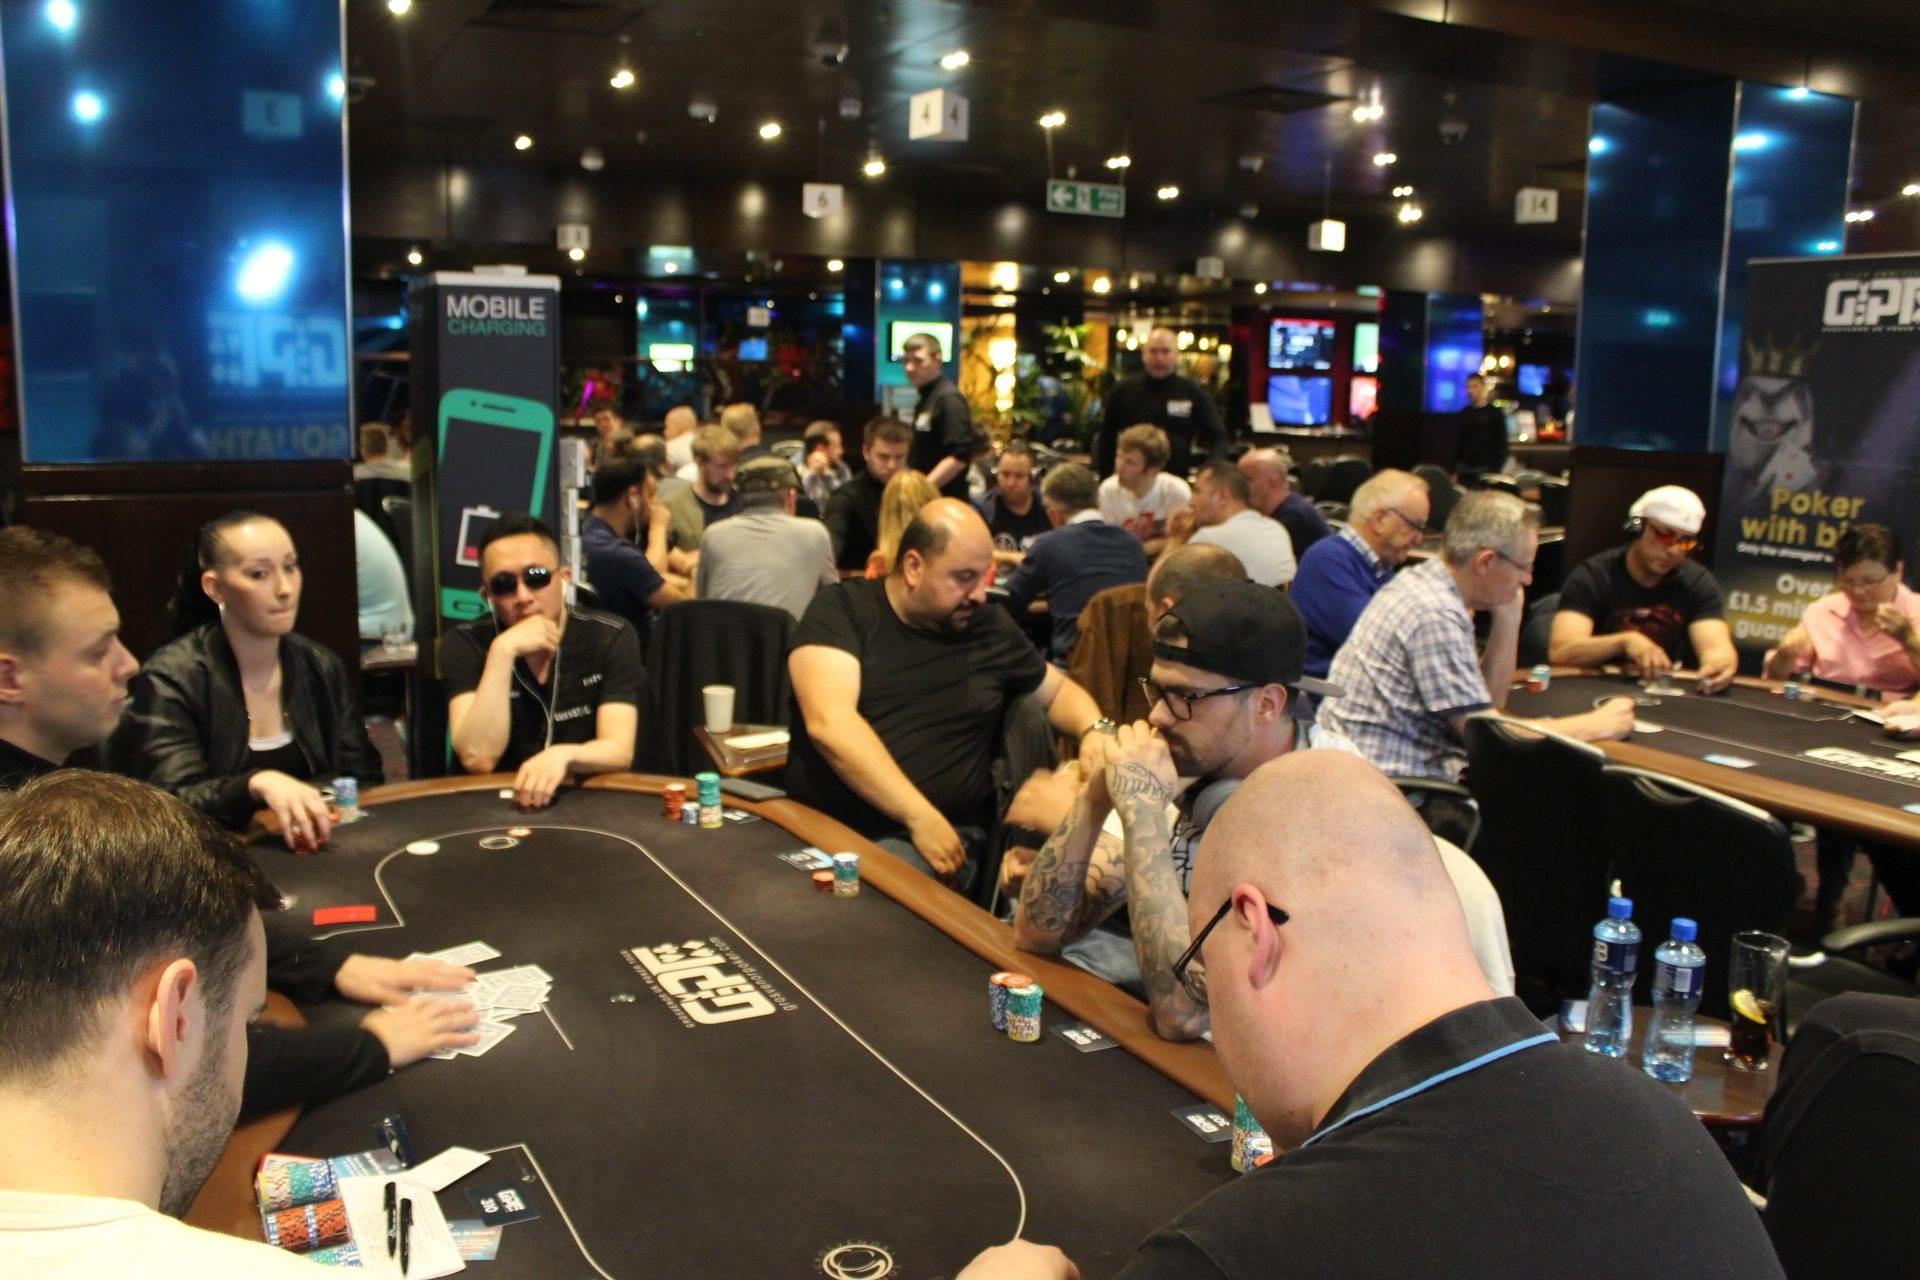 Poker tournament london 2016 strategia james bond roulette